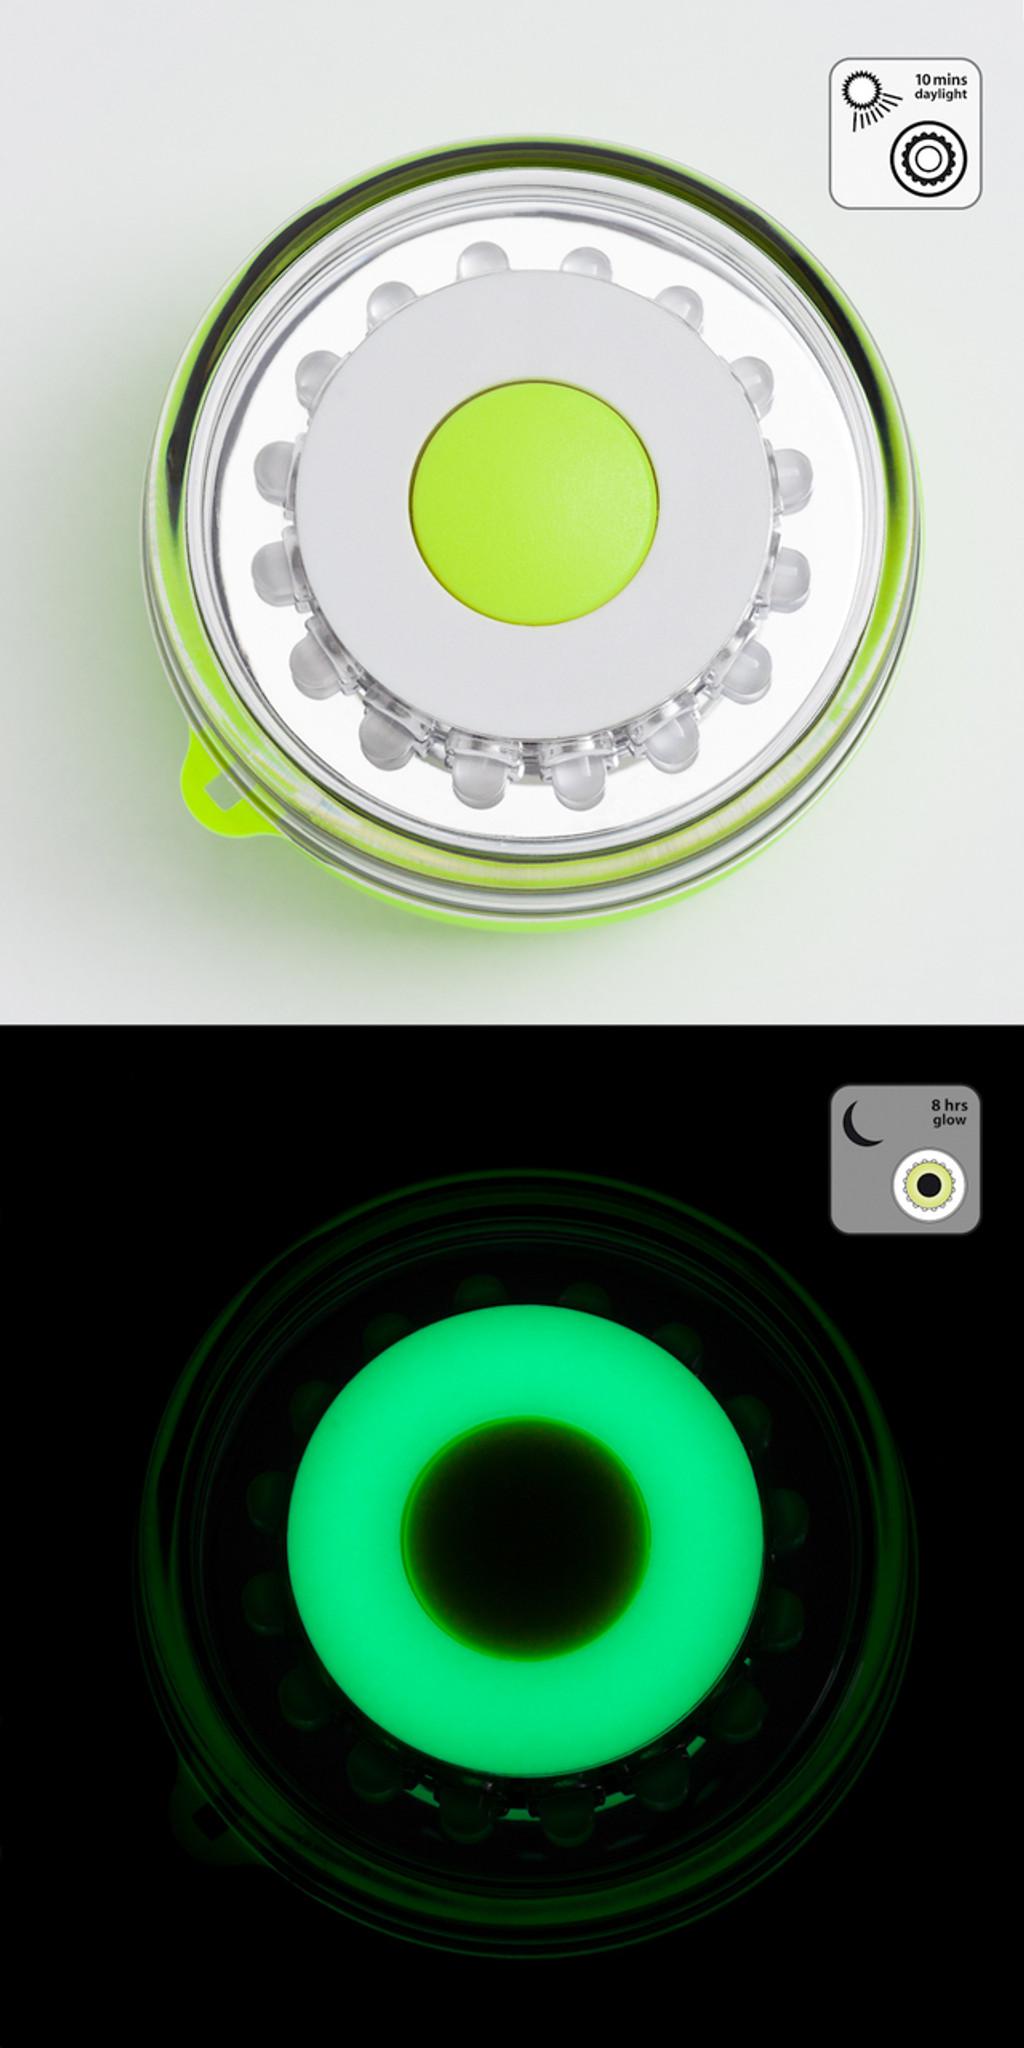 Glow In The Dark Navisafe Portable Navilight 360° 2NM Rescue Green